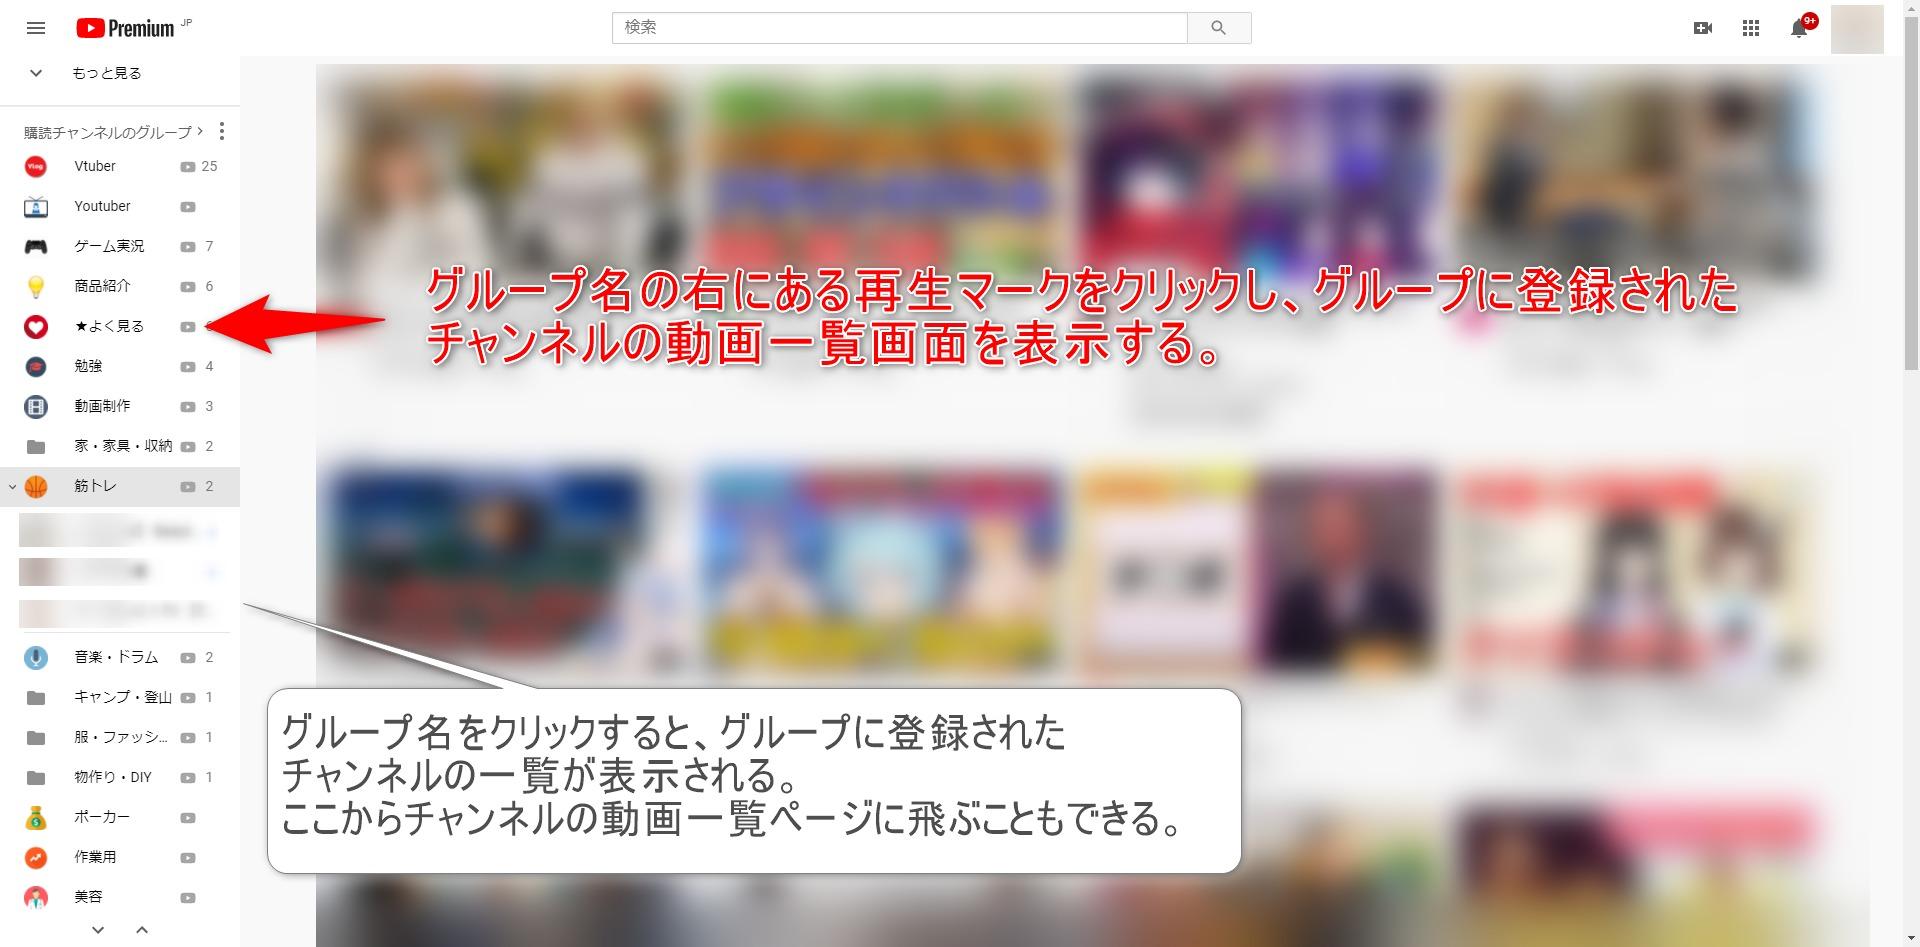 ▲Youtubeのトップ画面からグループに登録されたチャンネルの動画を一覧表示する(クリックで拡大)